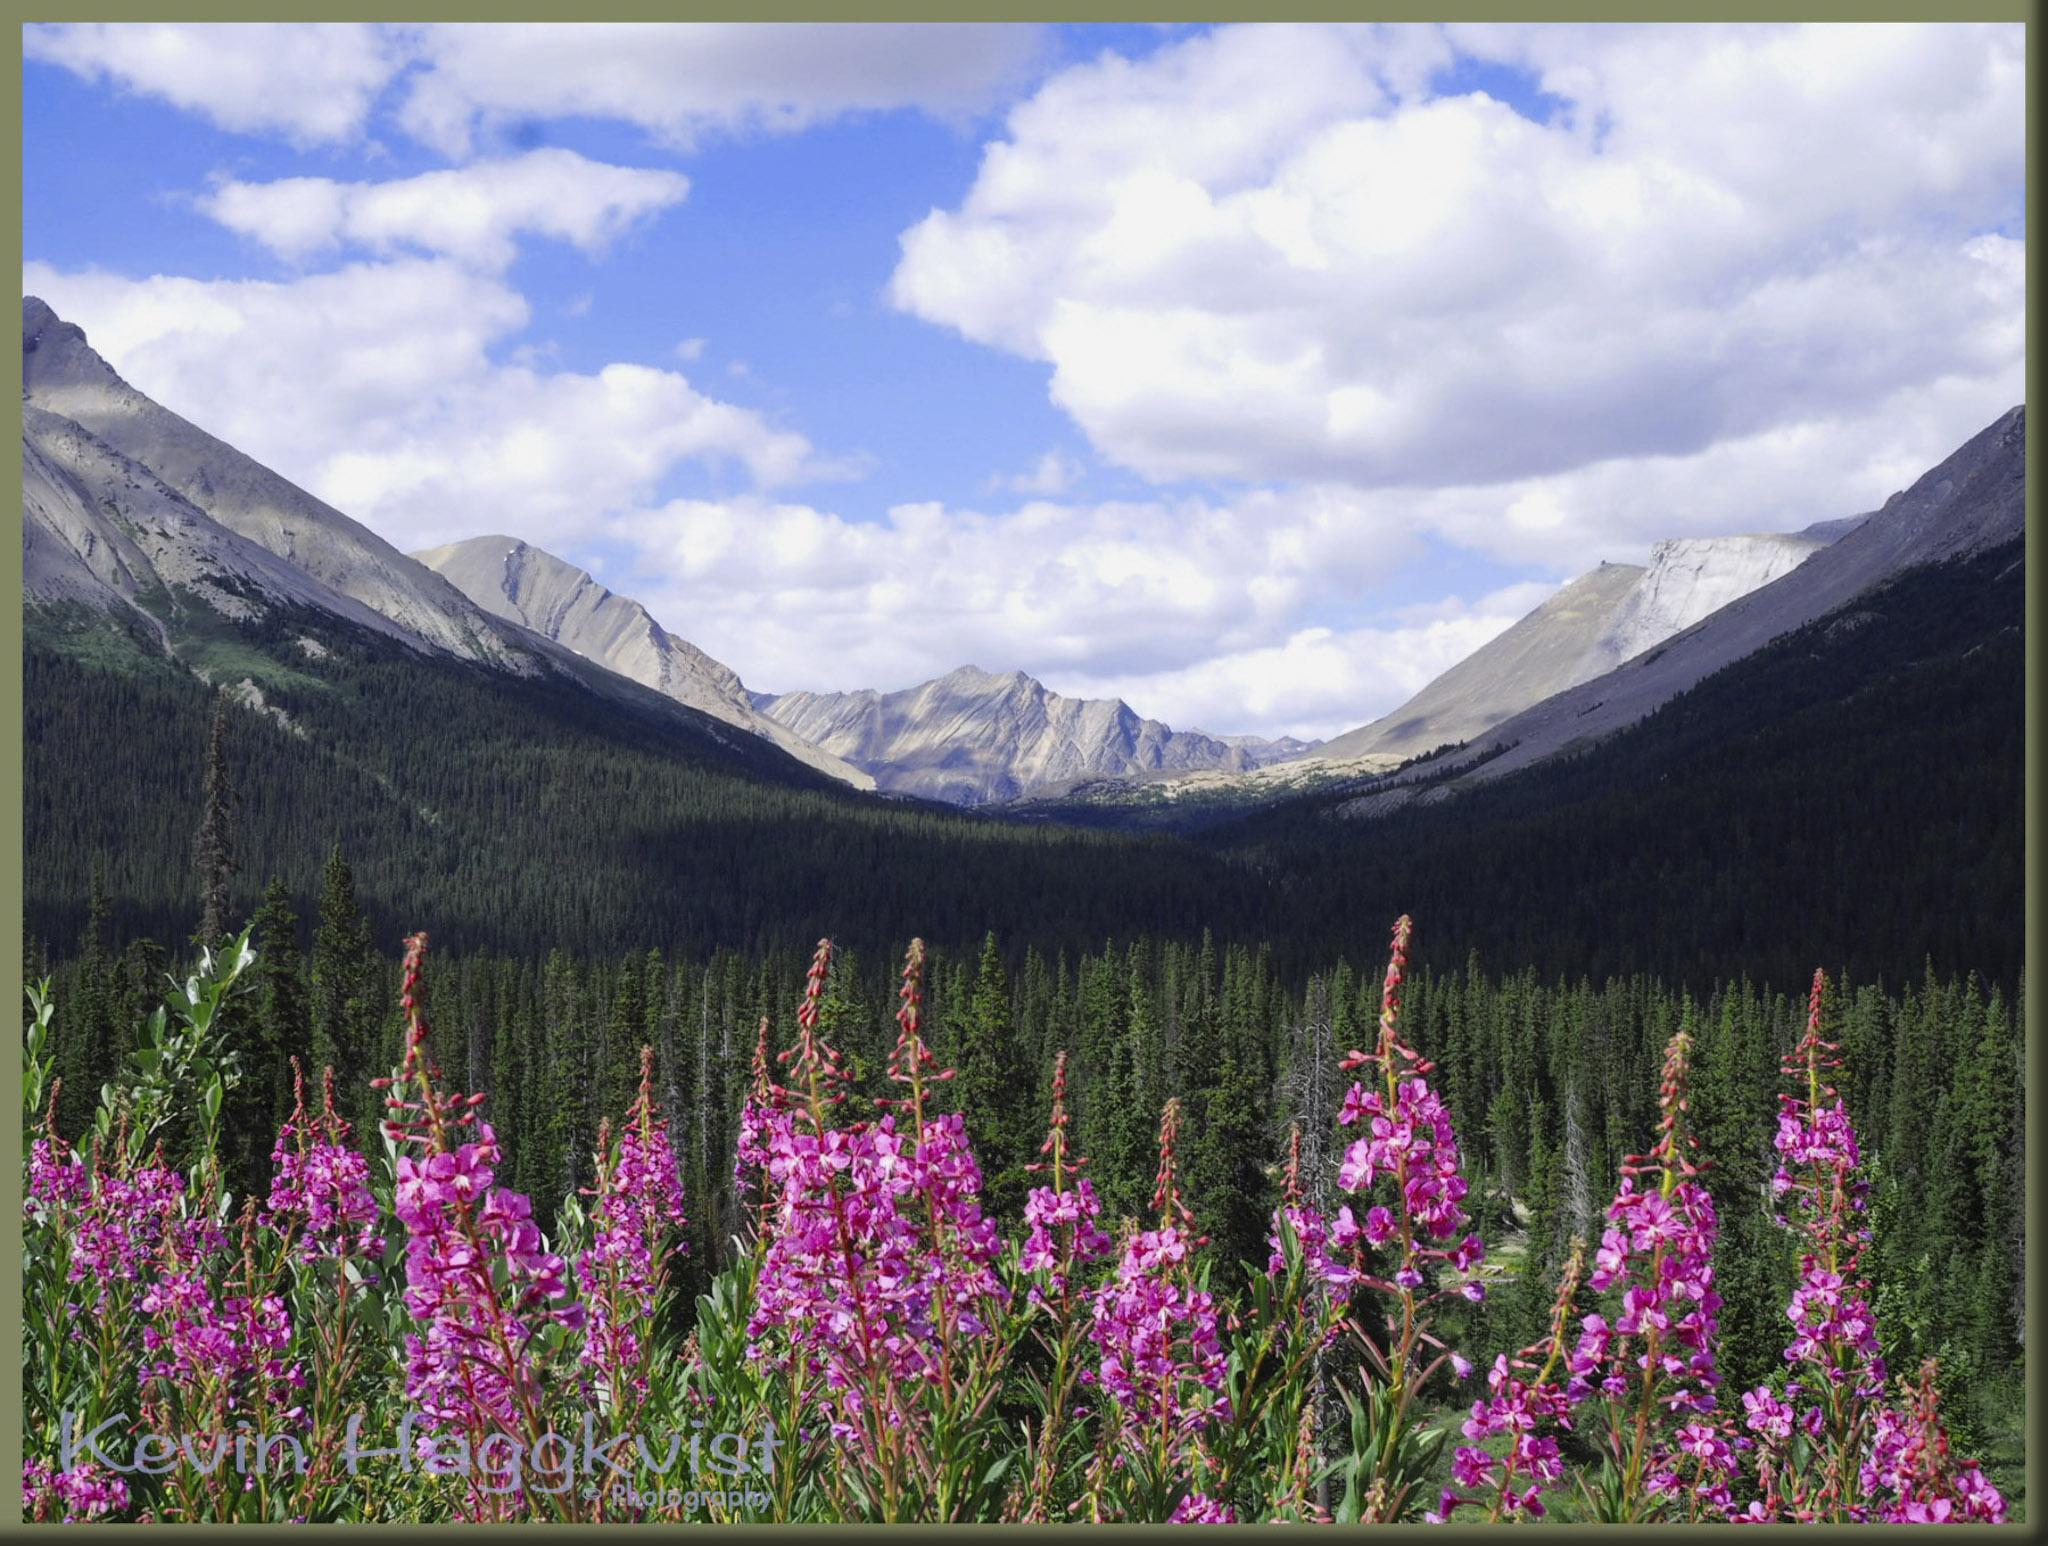 Mountain View - Kevin Haggkvist